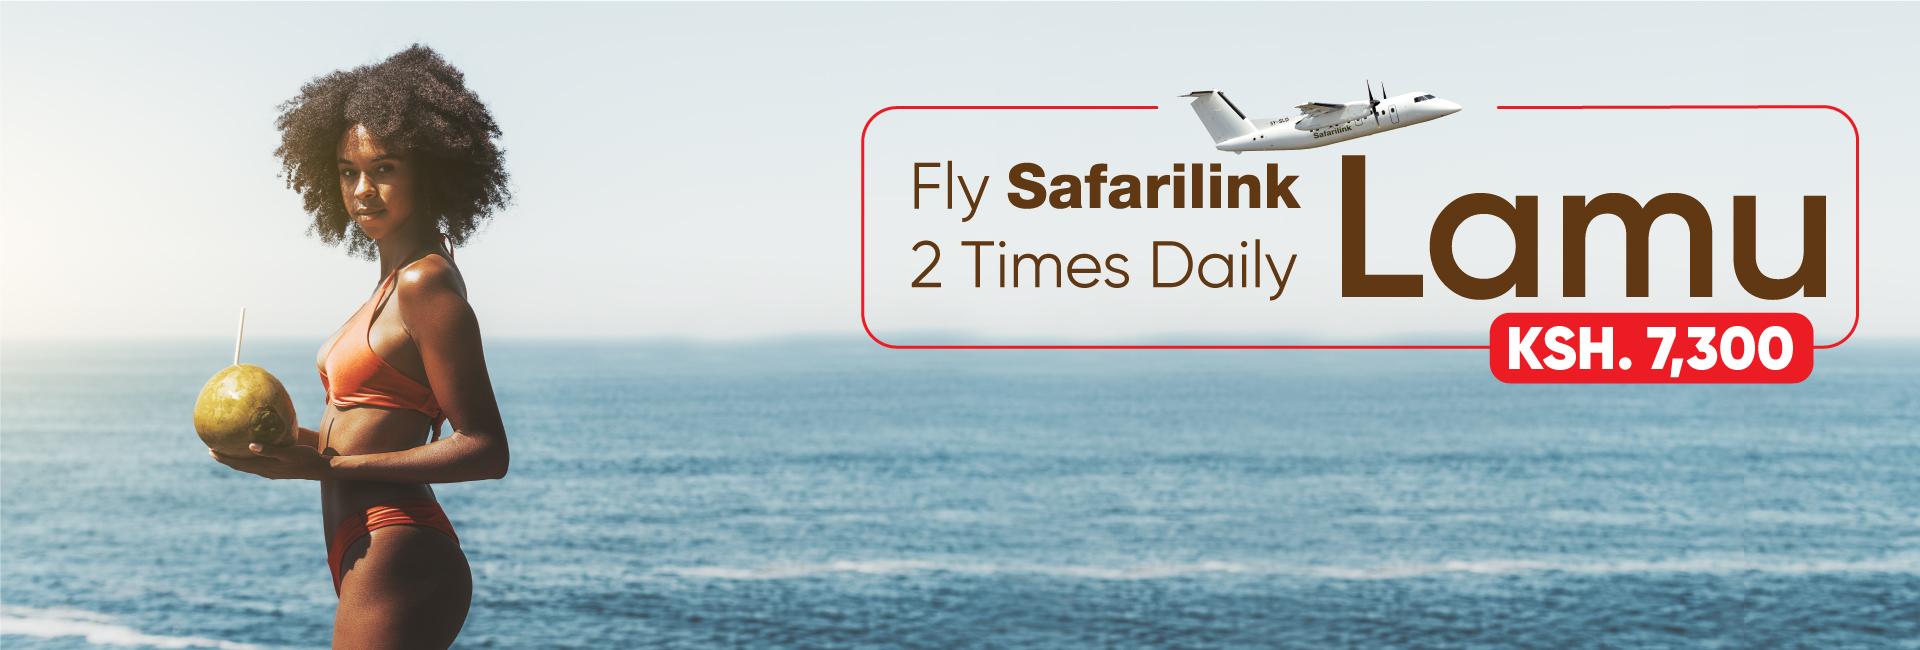 Fly Safarilink To LamuIsland Deals